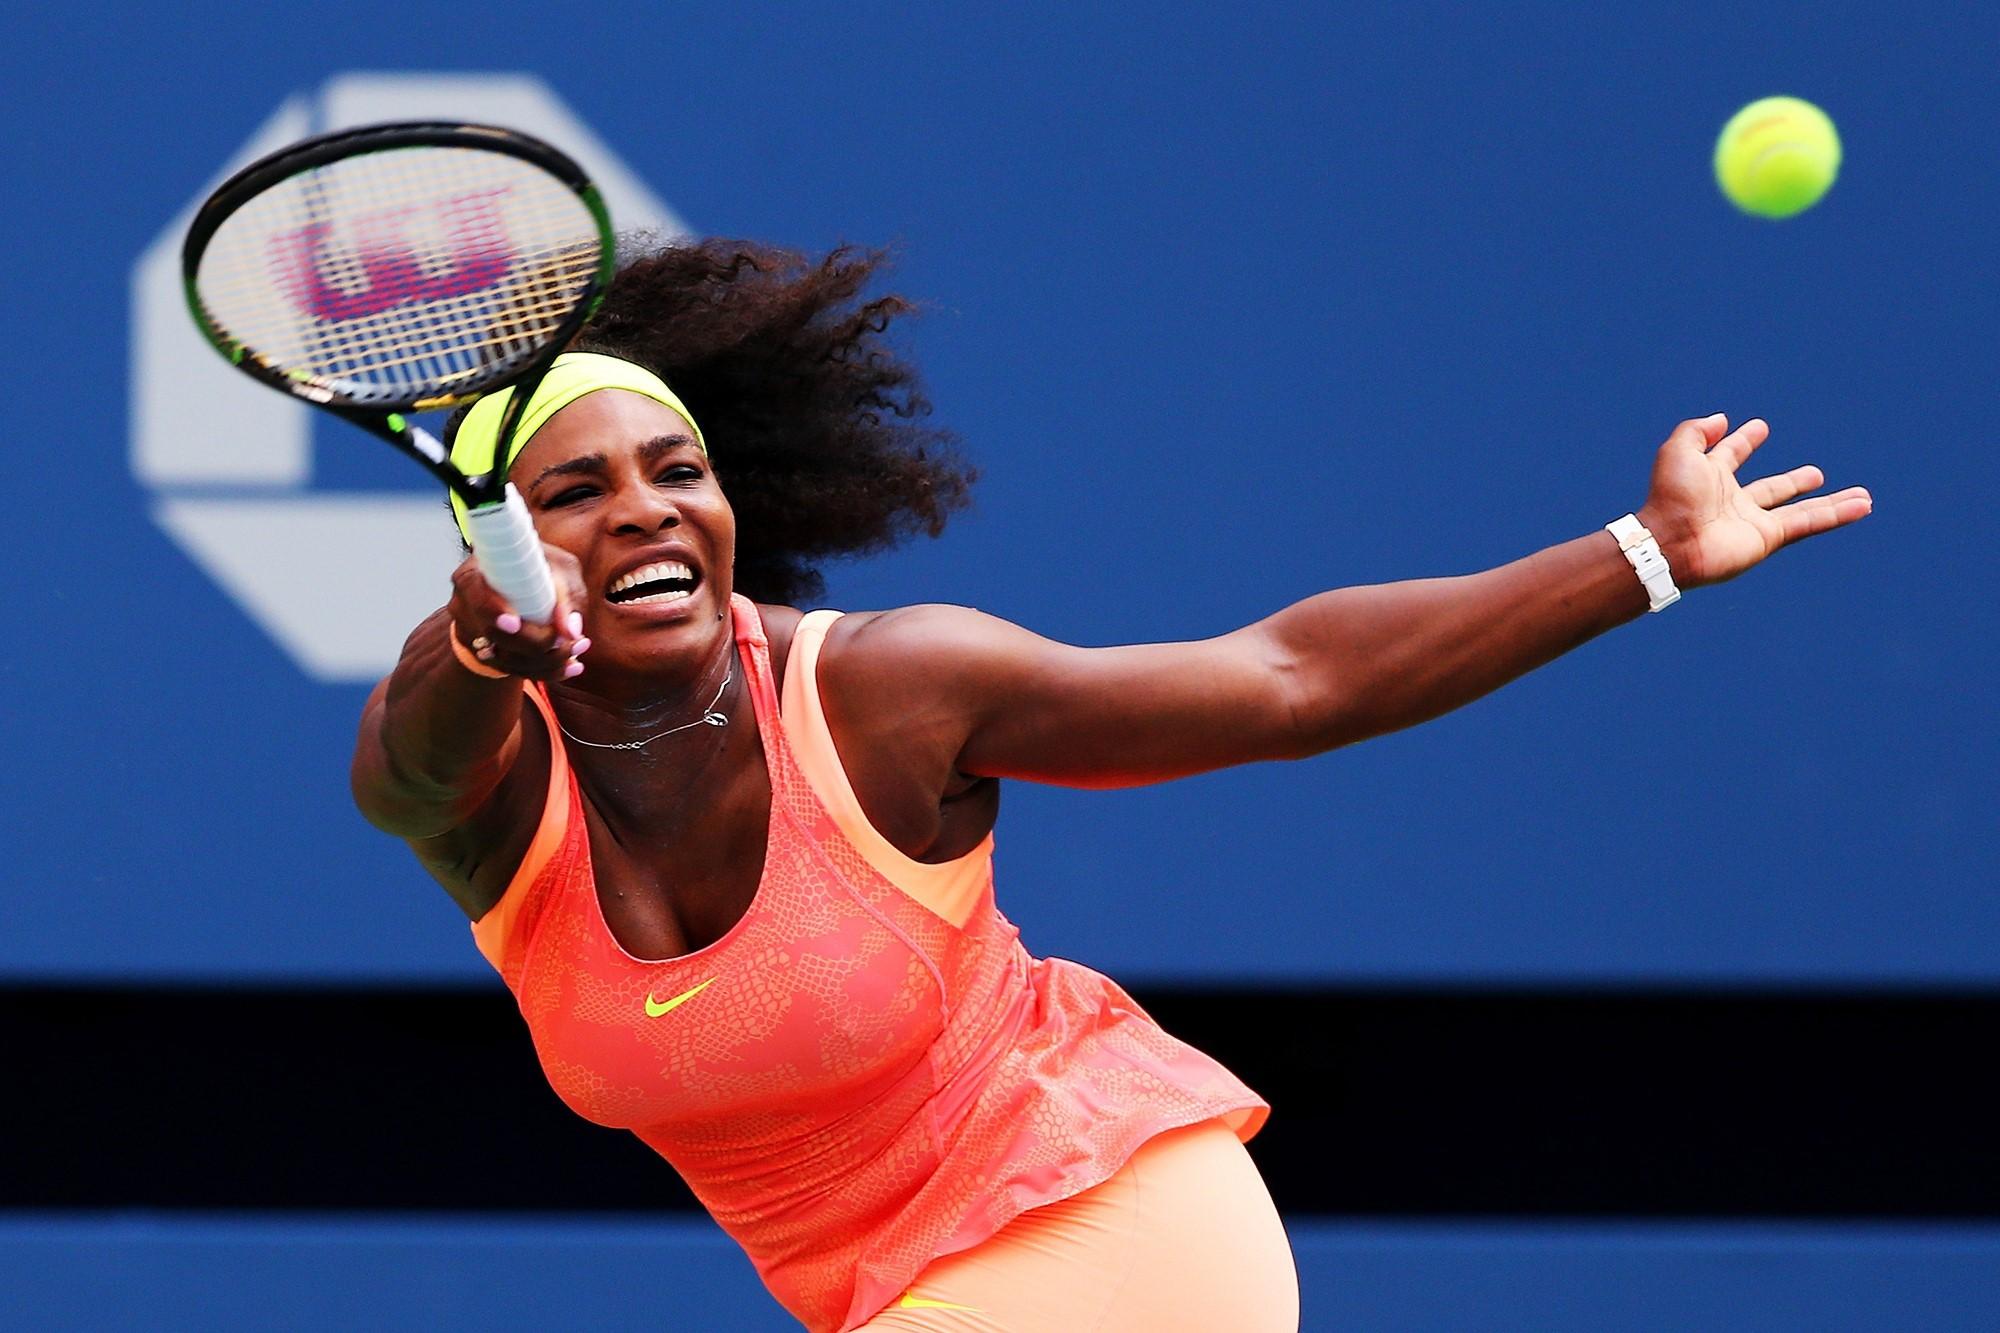 Serena Williams Background